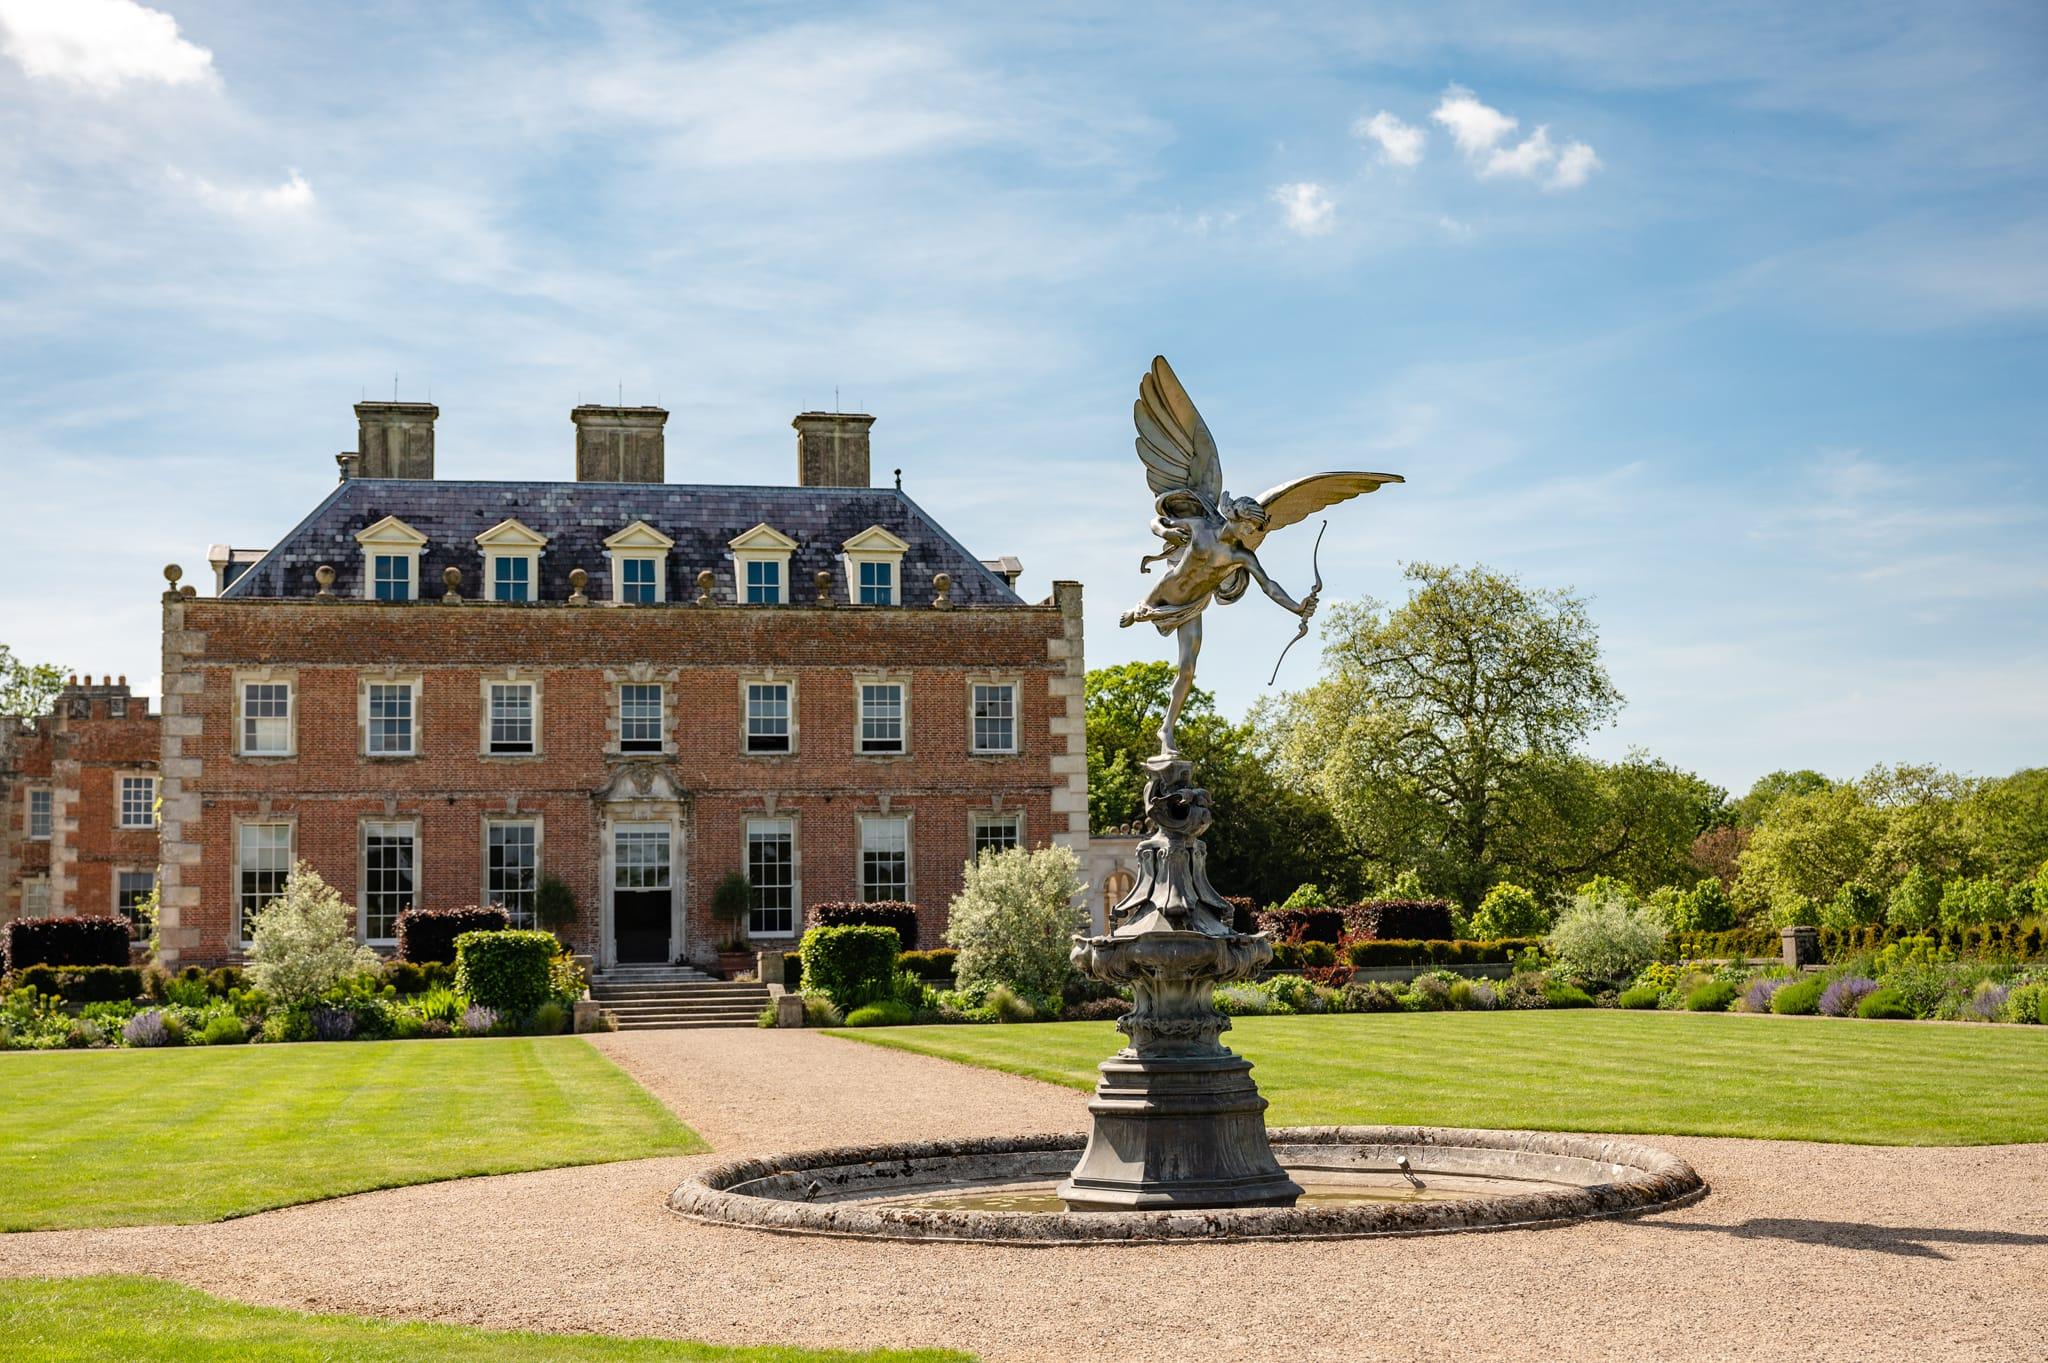 St Giles House wedding venue in Dorset